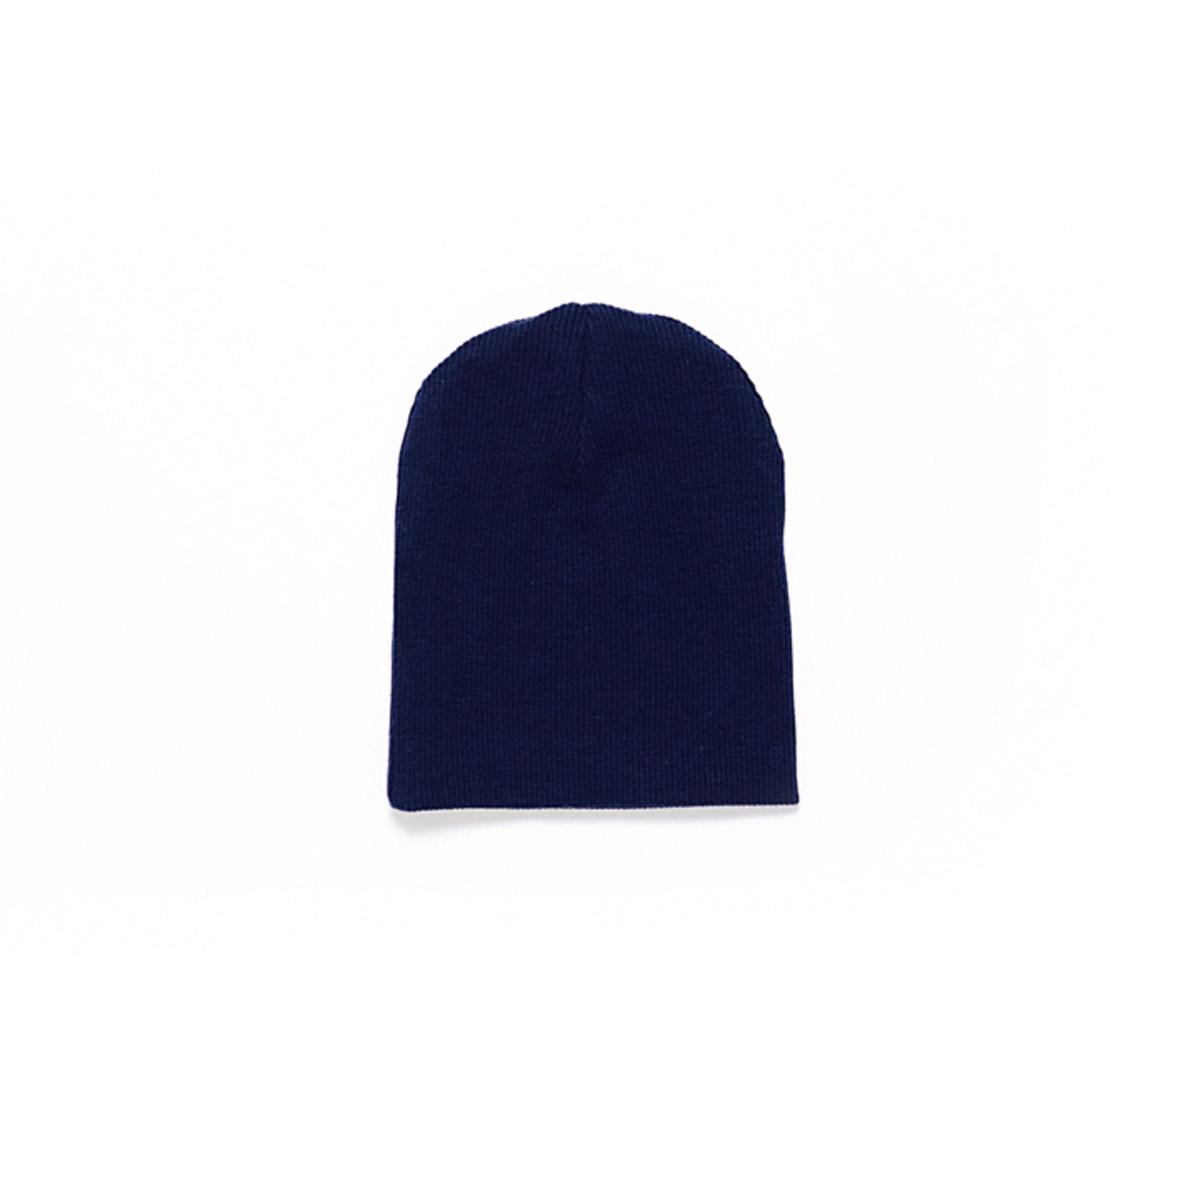 Шапочка Ёмаё (30-02) размер 38 синий<br>